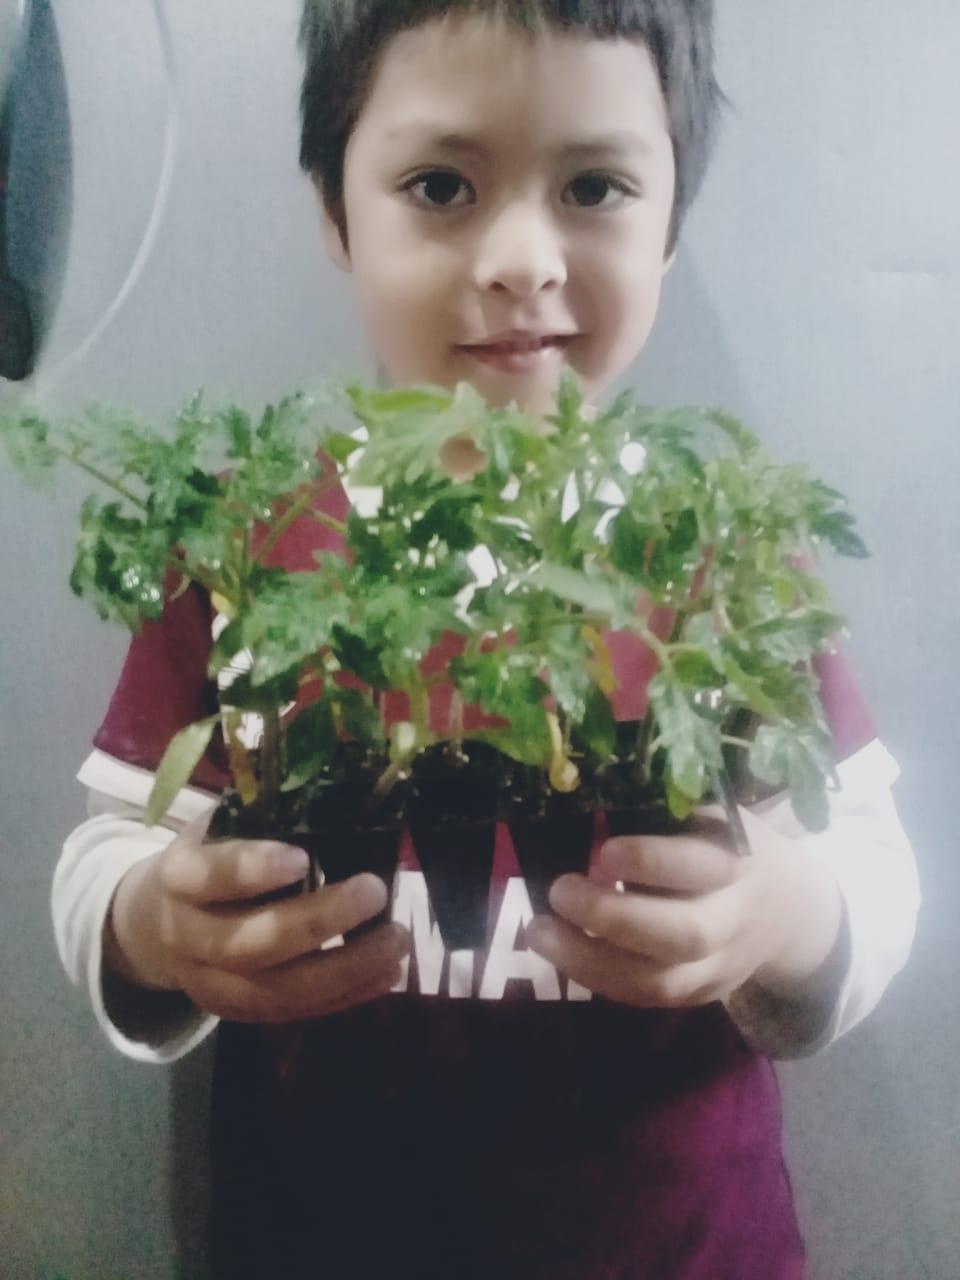 Niño con plantines